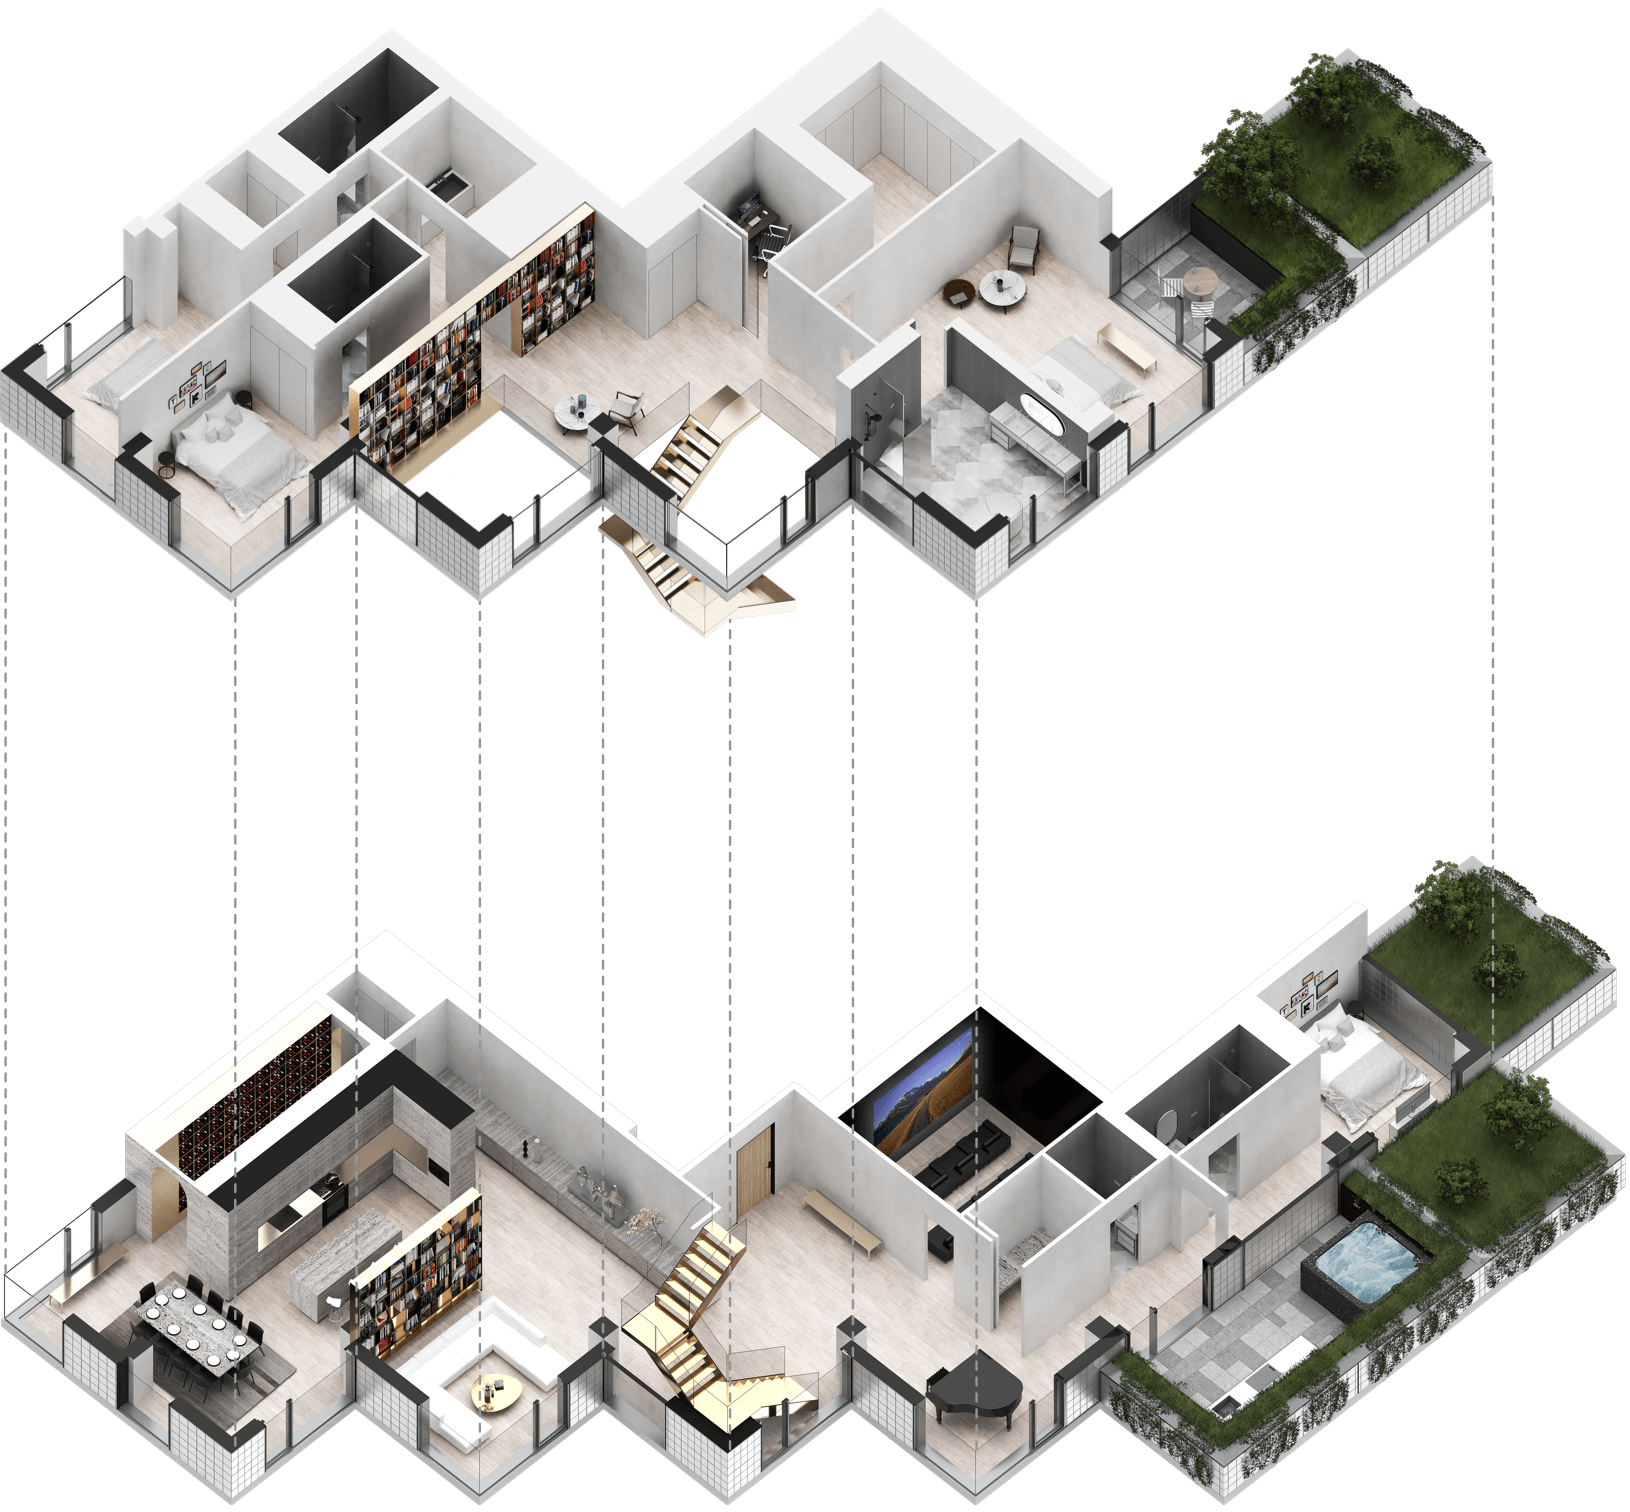 La Bibliothèque floorplan